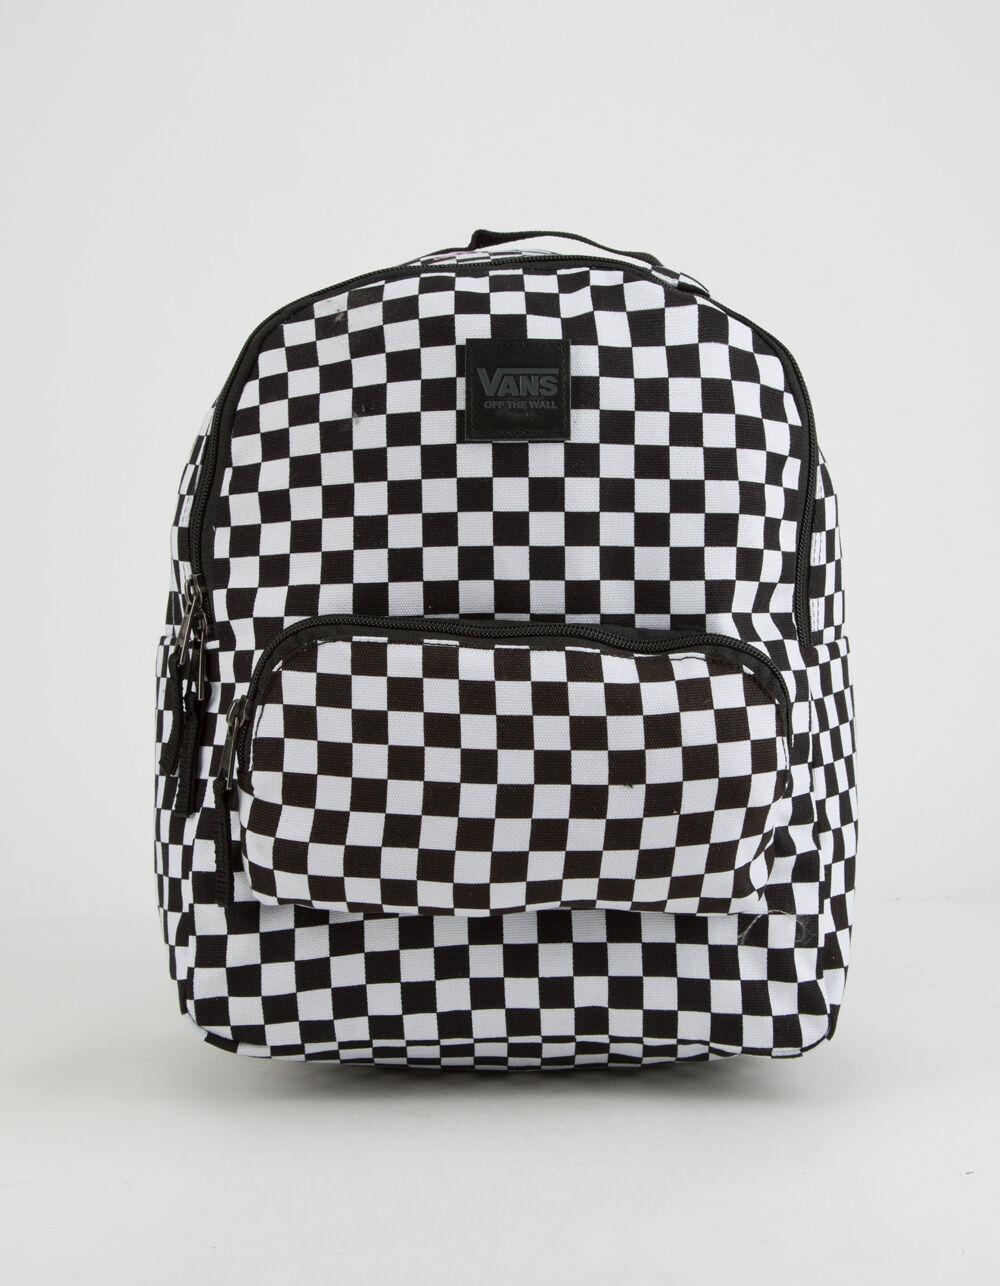 VANS Checkered Mini Backpack